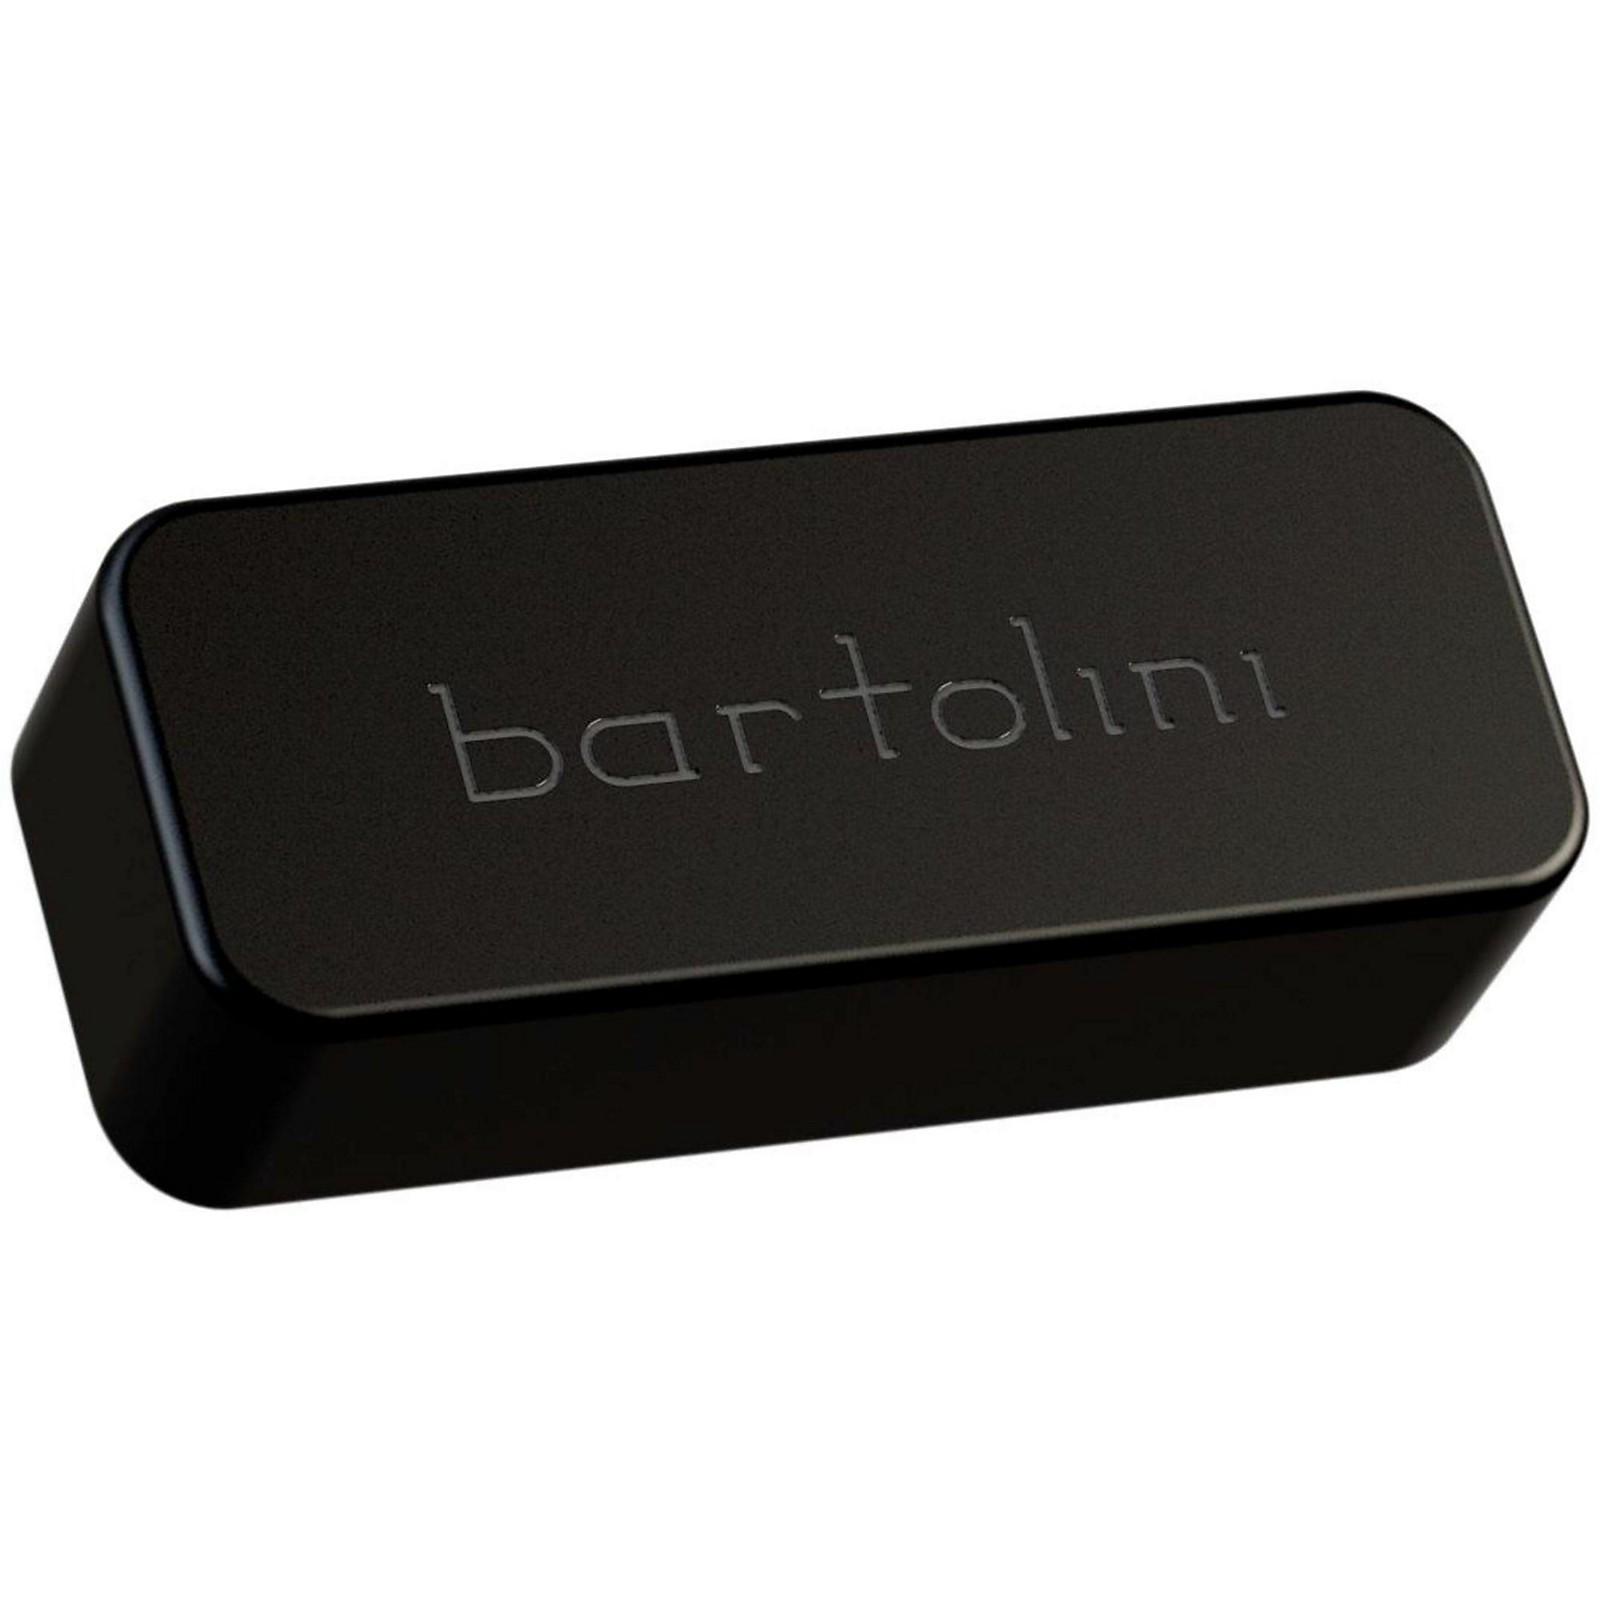 Bartolini BRPSB-92C-B P90 Humbucker Dual Coil Neck 6-String Guitar Pickup